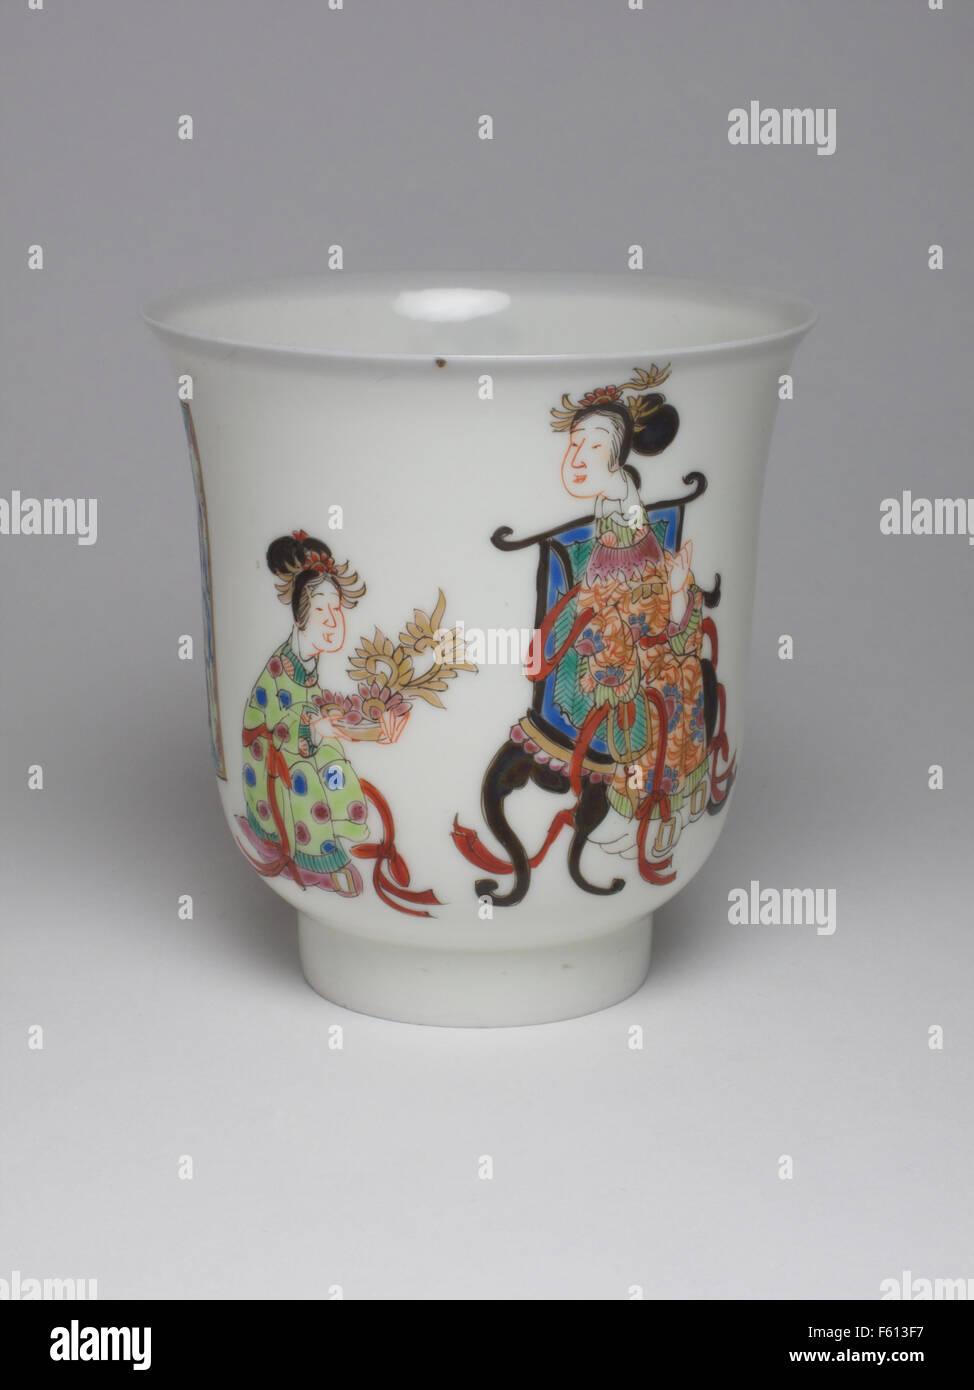 Antique 19th century Japanese porcelain beaker - Stock Image